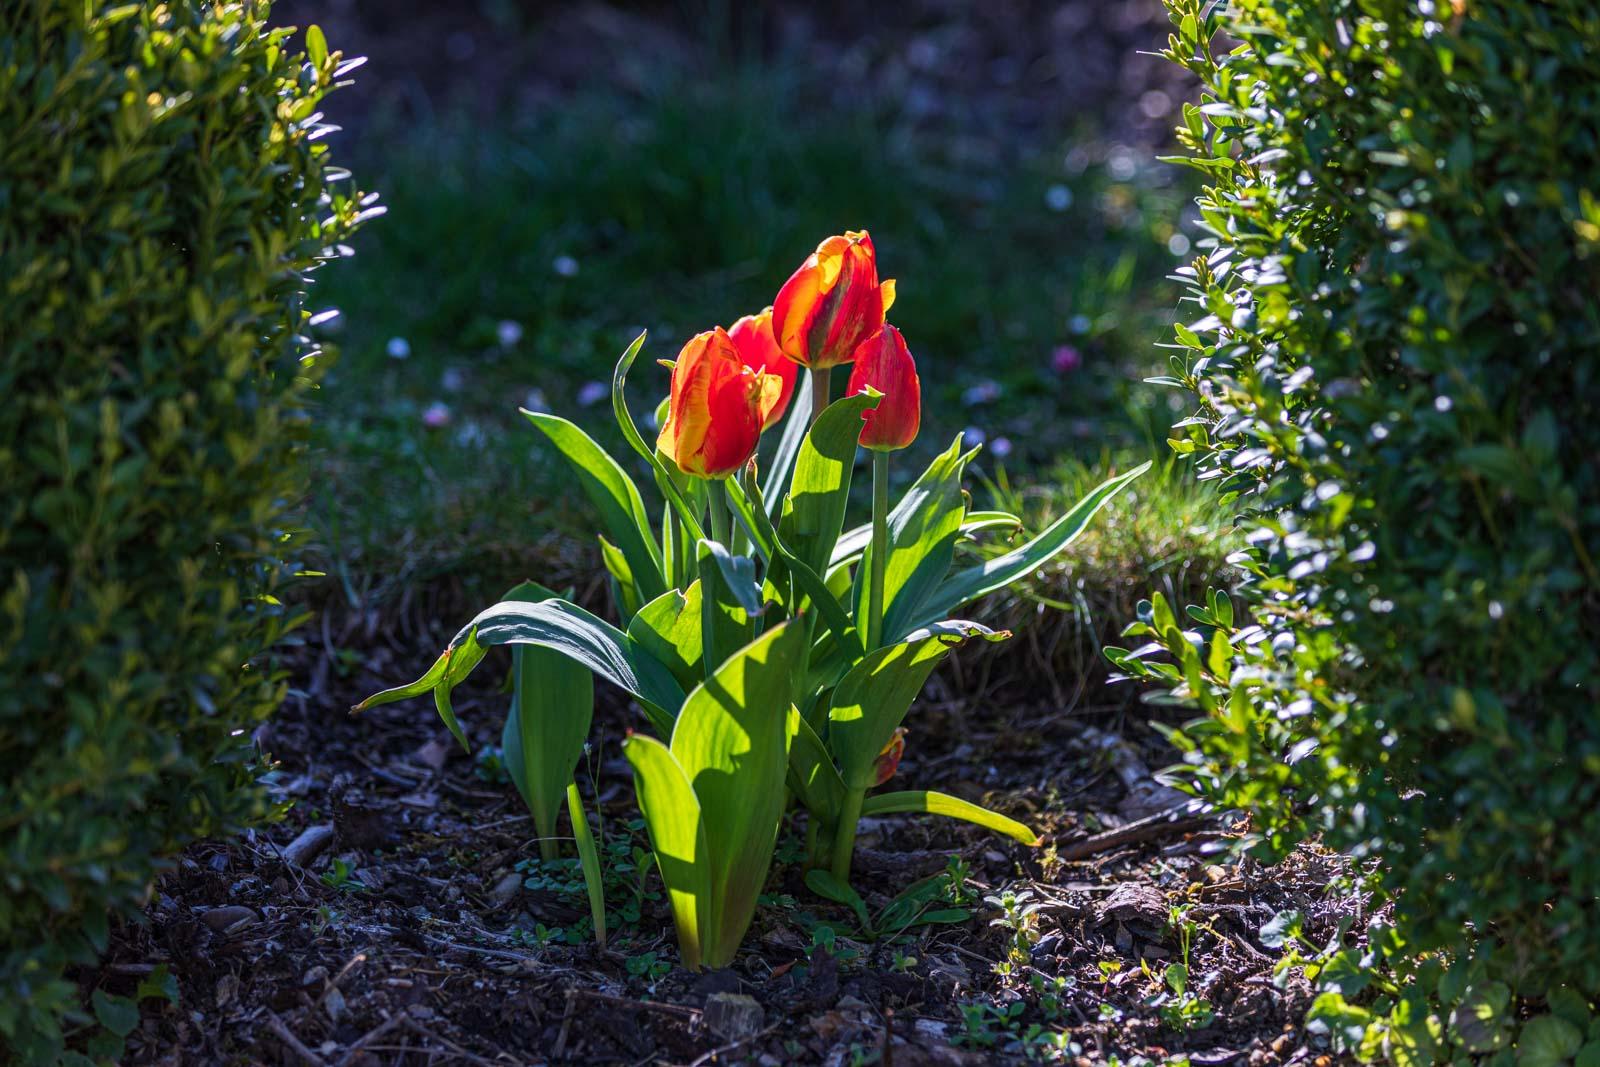 Blumen, Flowers, Frühling, Garten, Natur, Nature, Spring